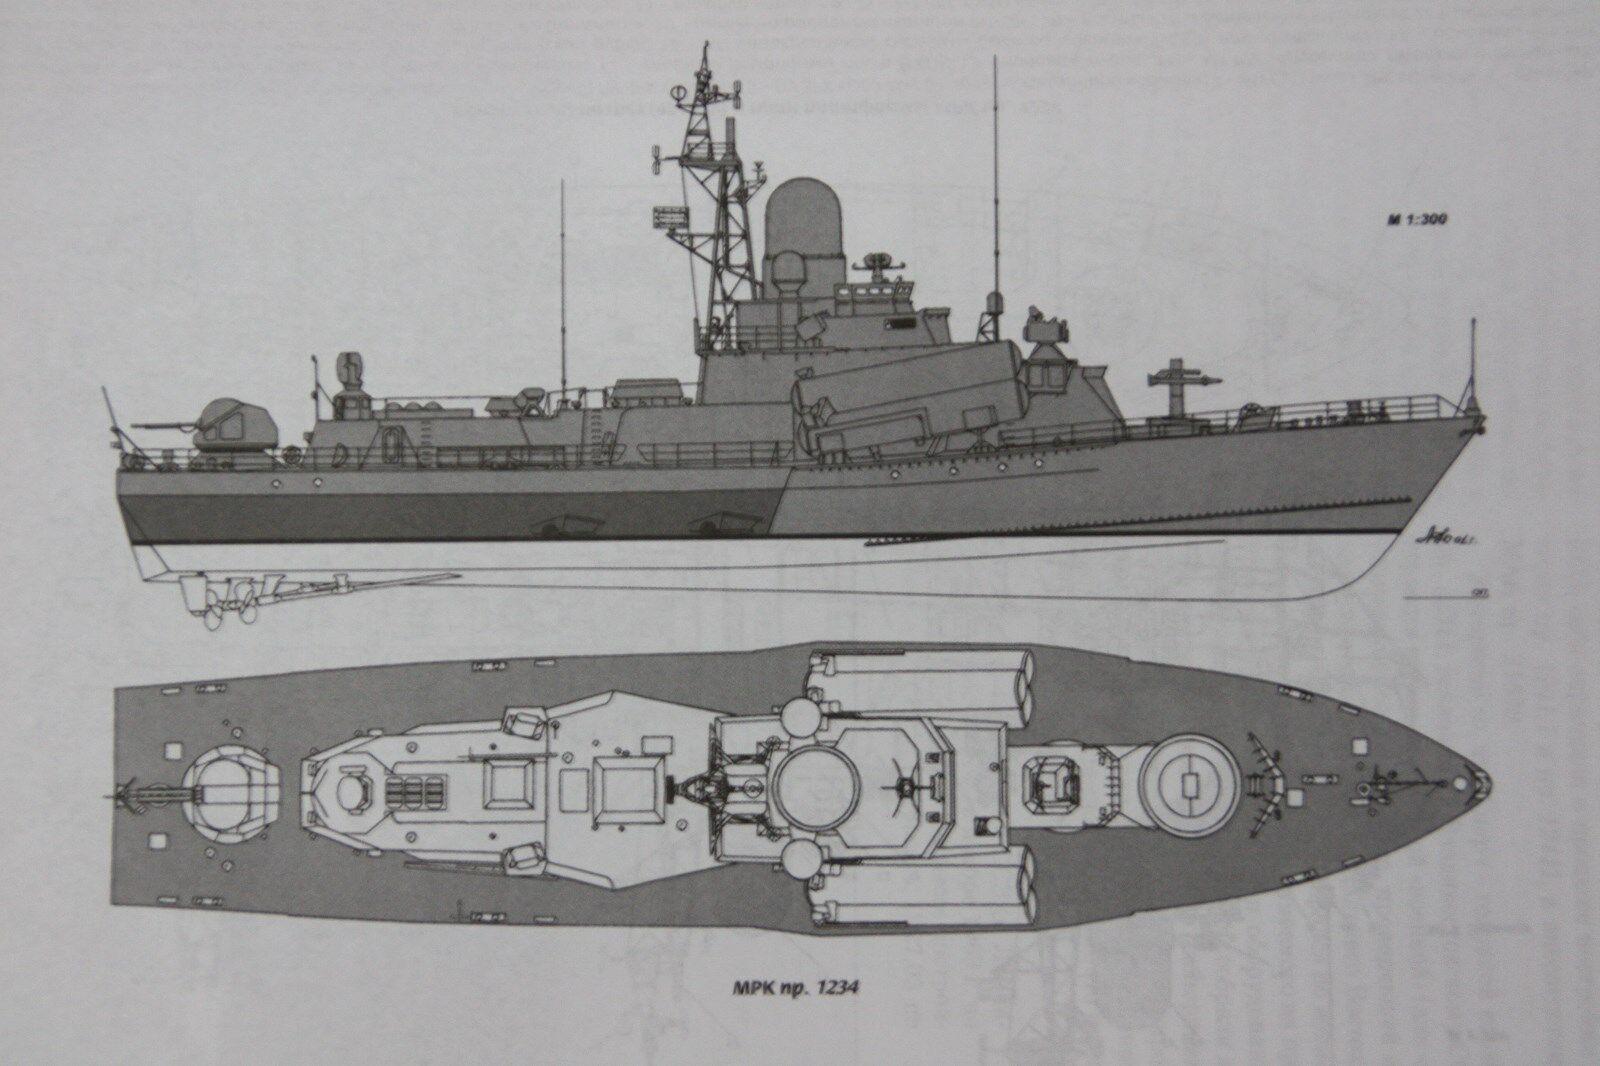 MCA Rumpf soviético raketenkorvette Nanuchka-clase proyecto 1234 en m1 60.